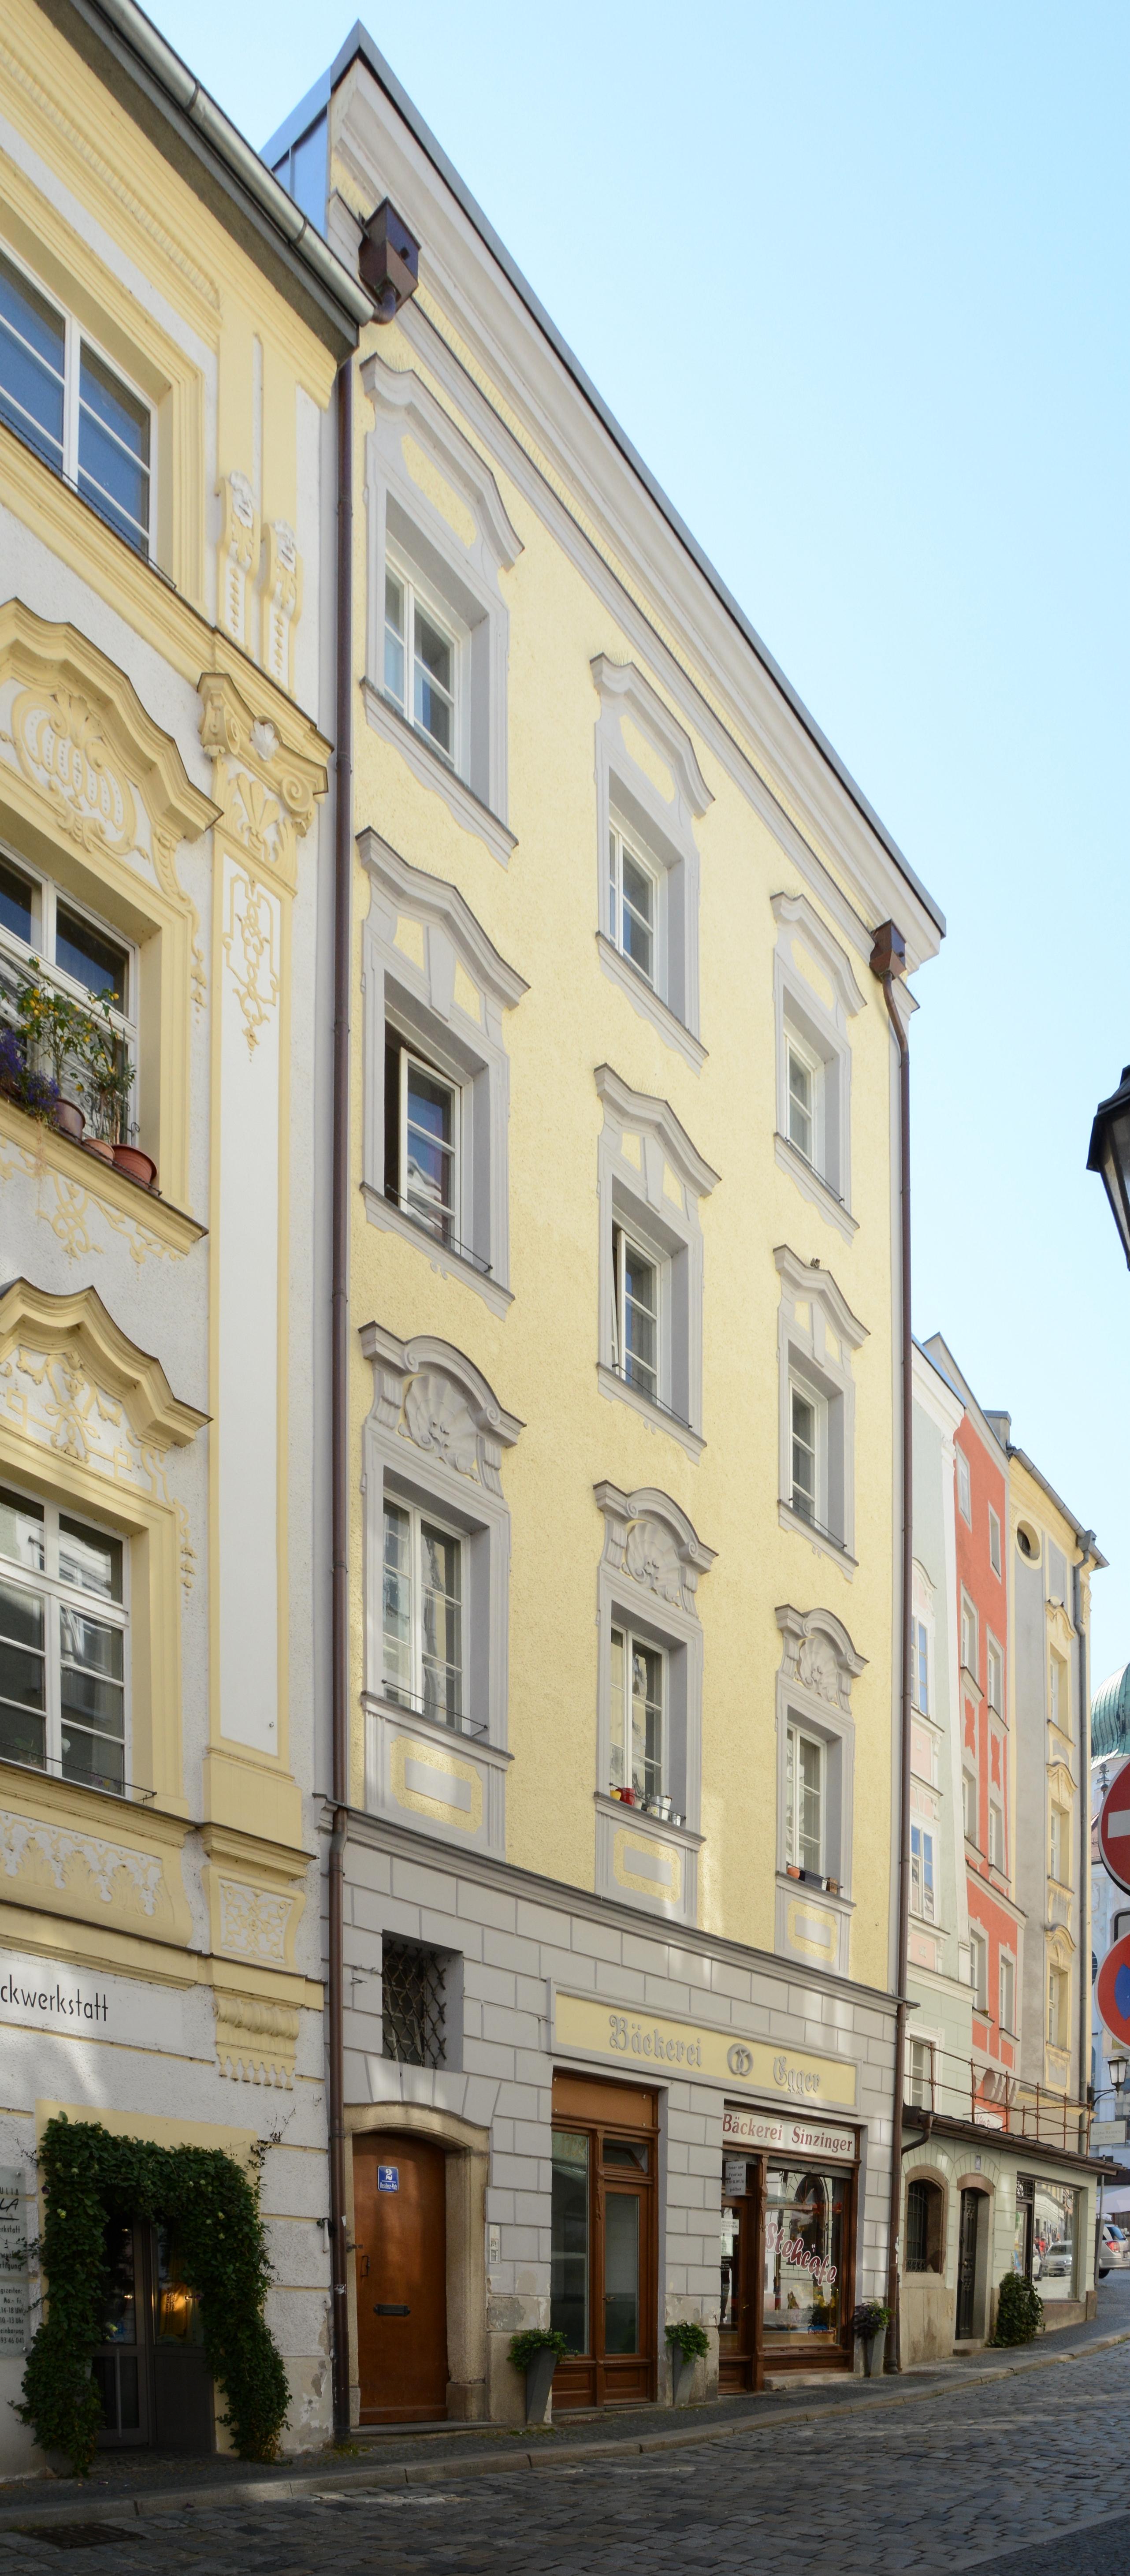 Dateiresidenzplatz 2 Passau Cjpg Wikipedia